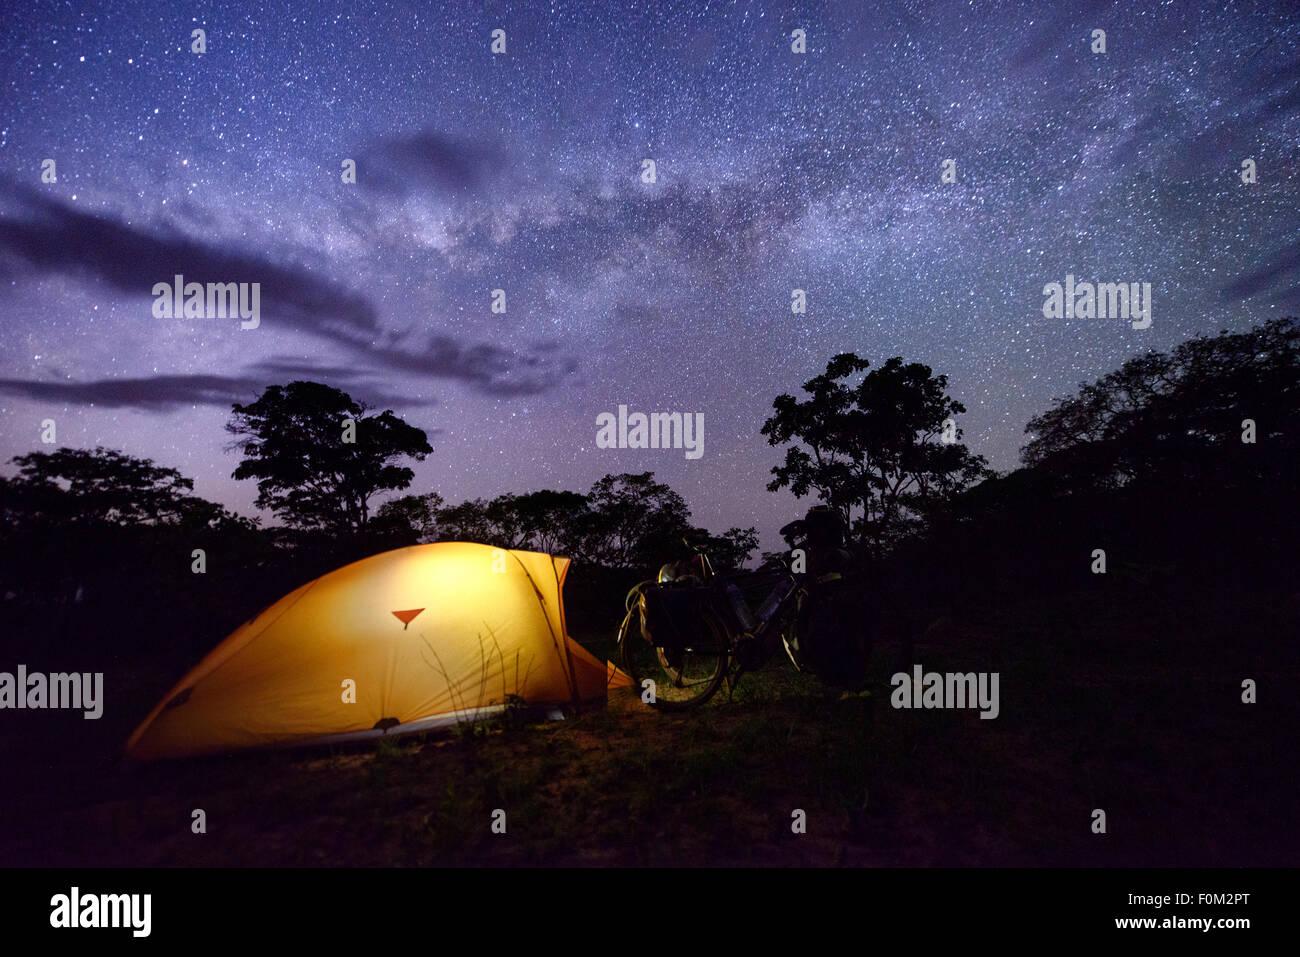 Camping in the Tanzanian bush, Africa - Stock Image